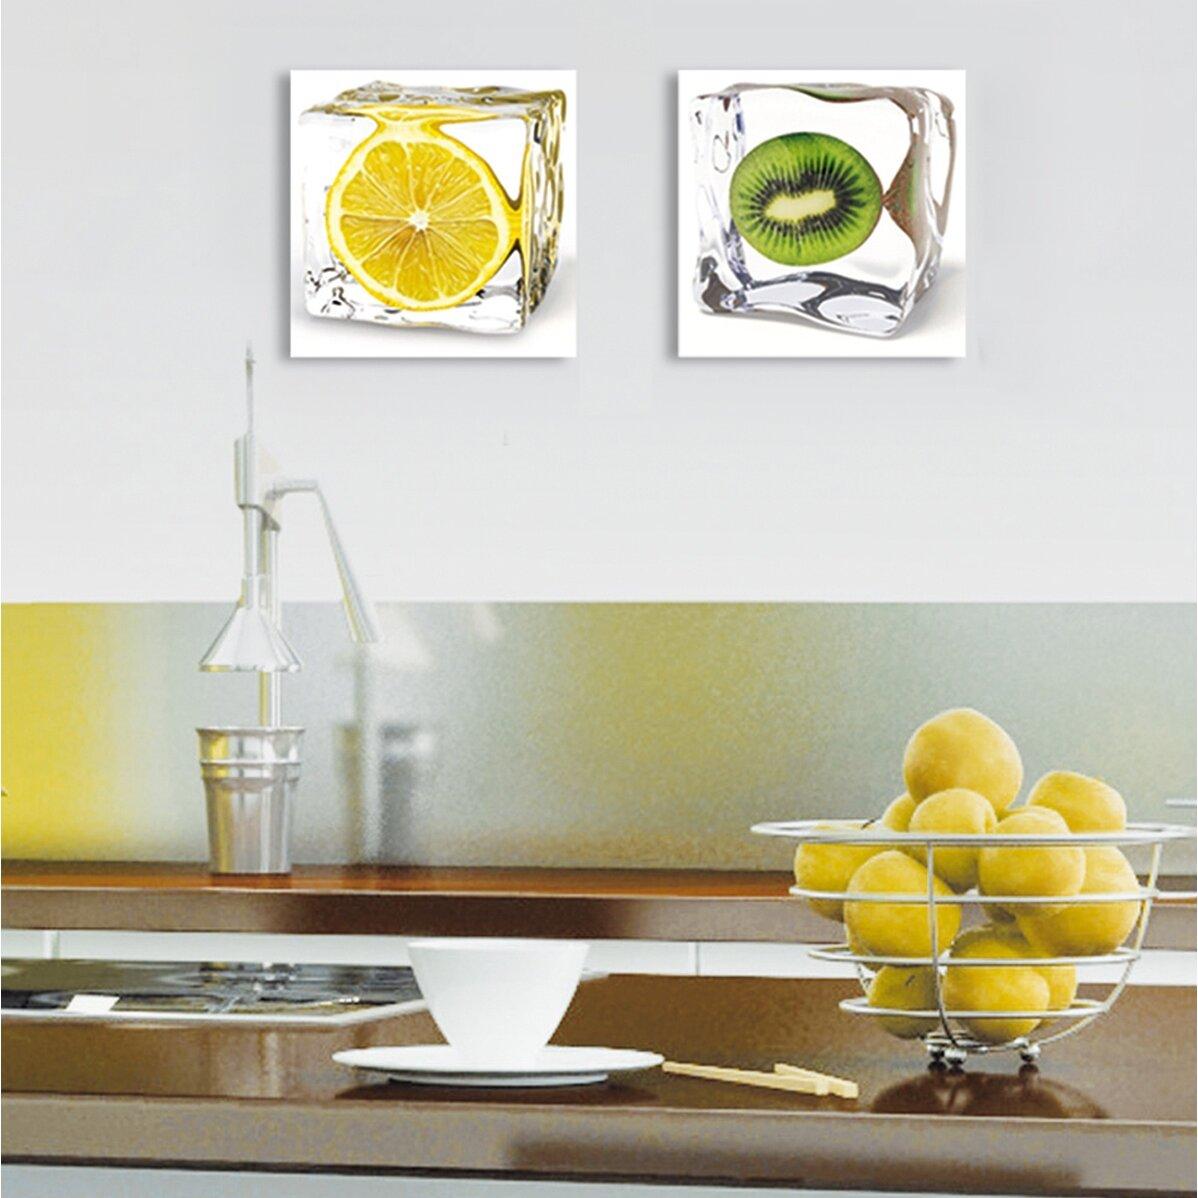 Platin art deco glass iced fruits 2 piece photographic print set reviews wayfair - Deco glace ...